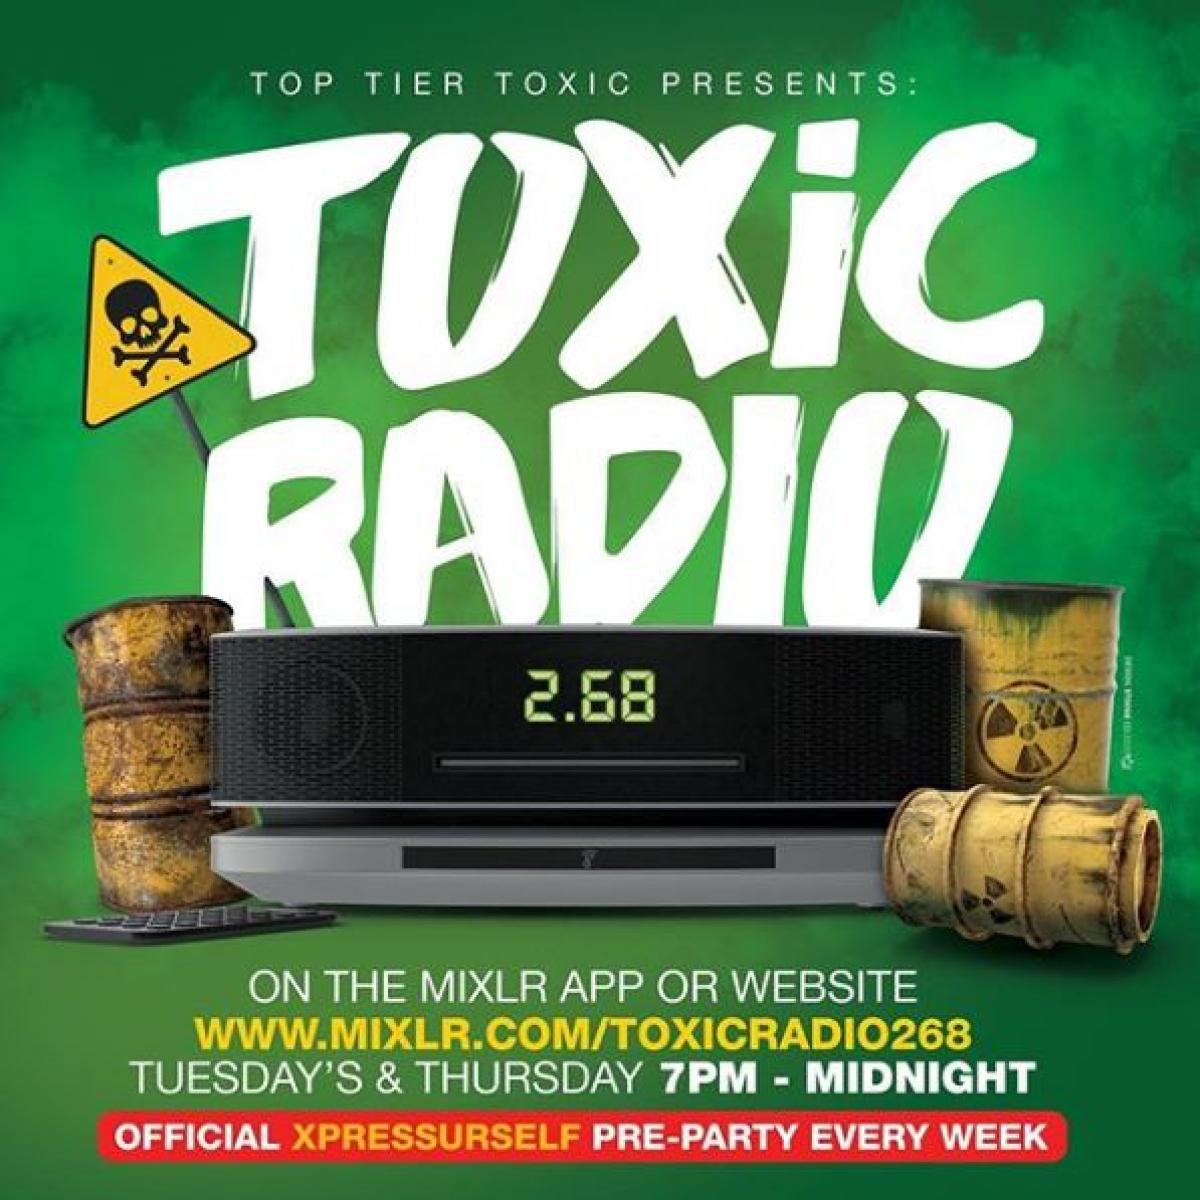 Toxic Radio flyer or graphic.